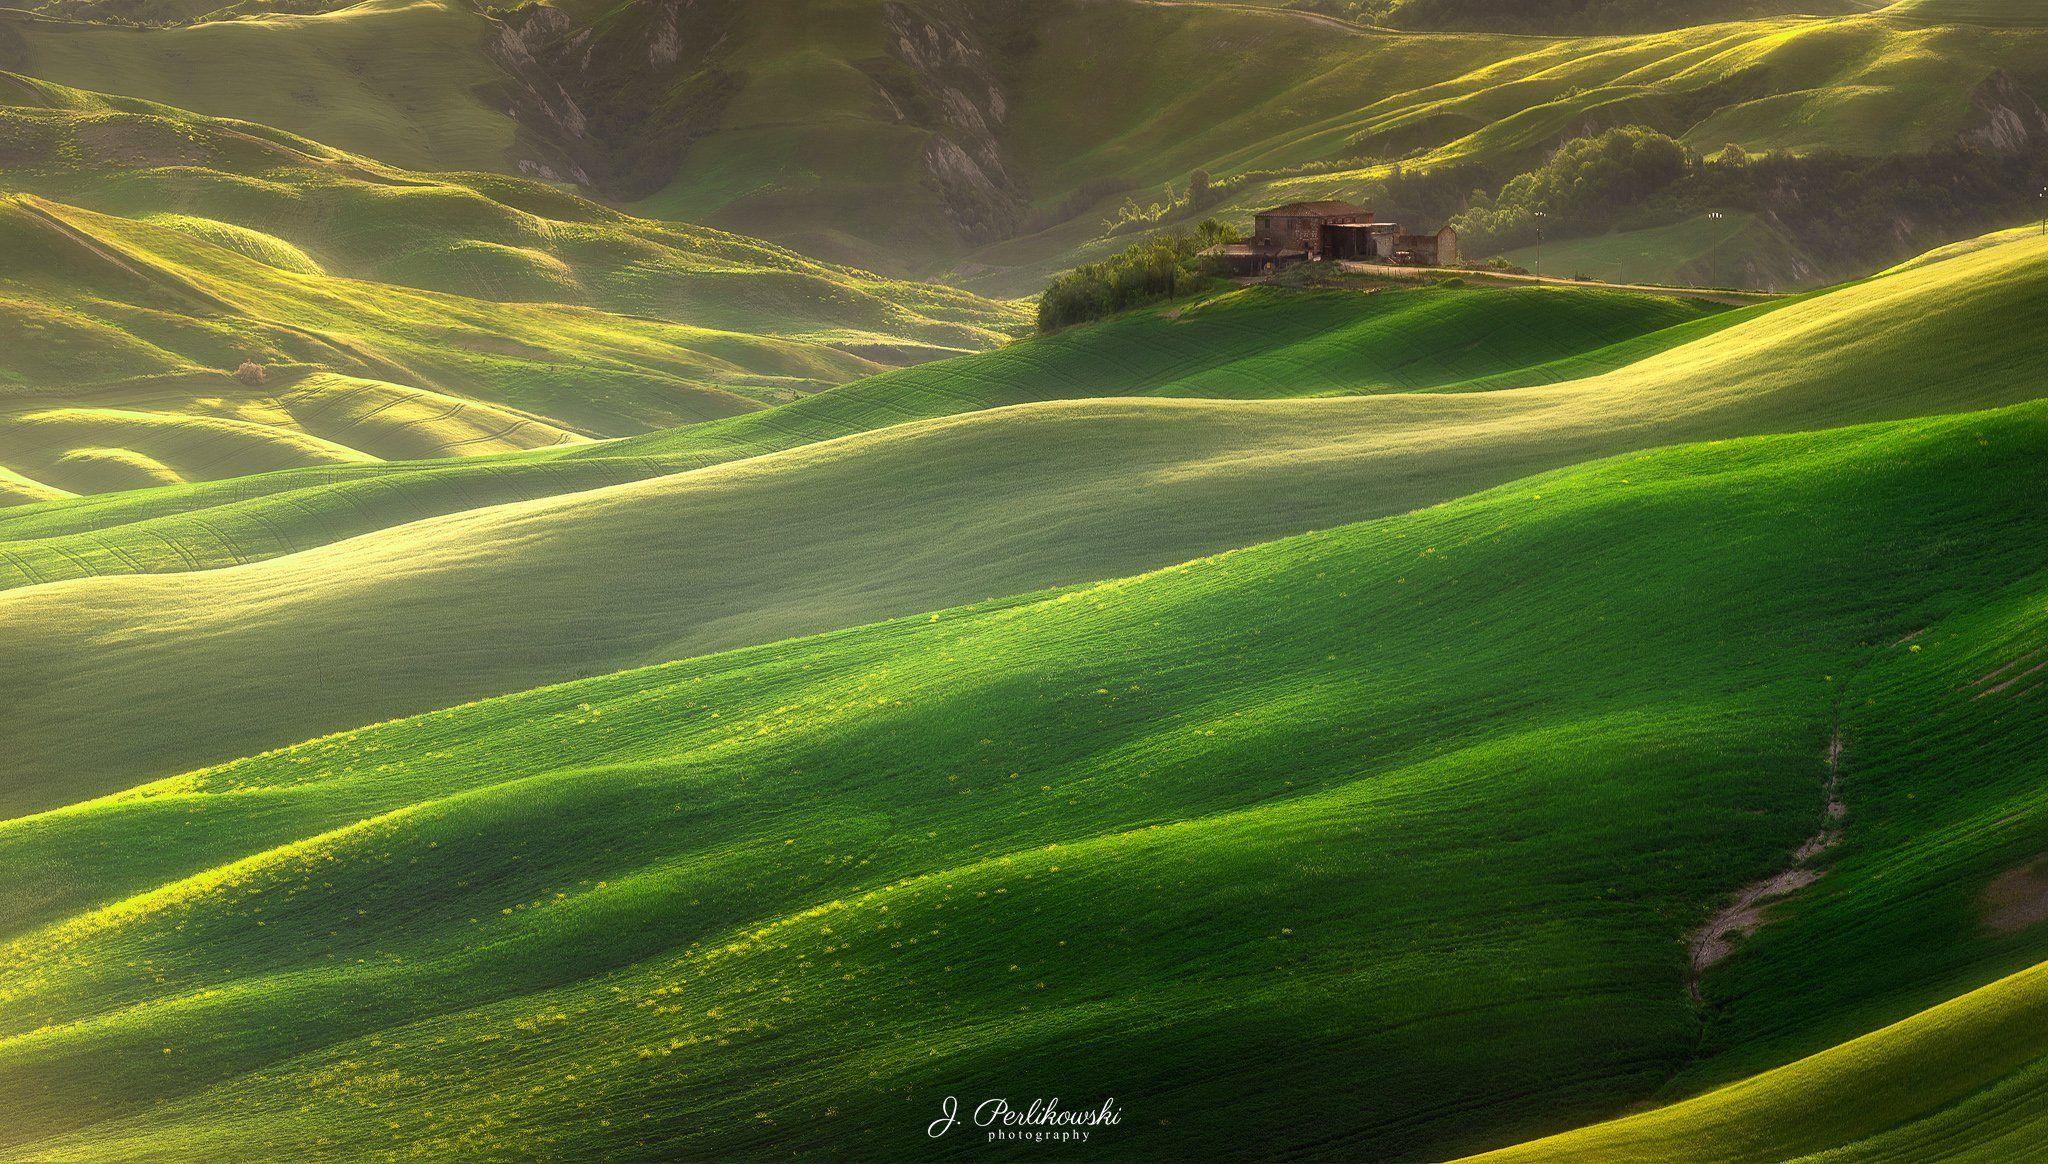 tuscany, landscape, italy, crete senesi, green fields,, Perlikowski Jakub